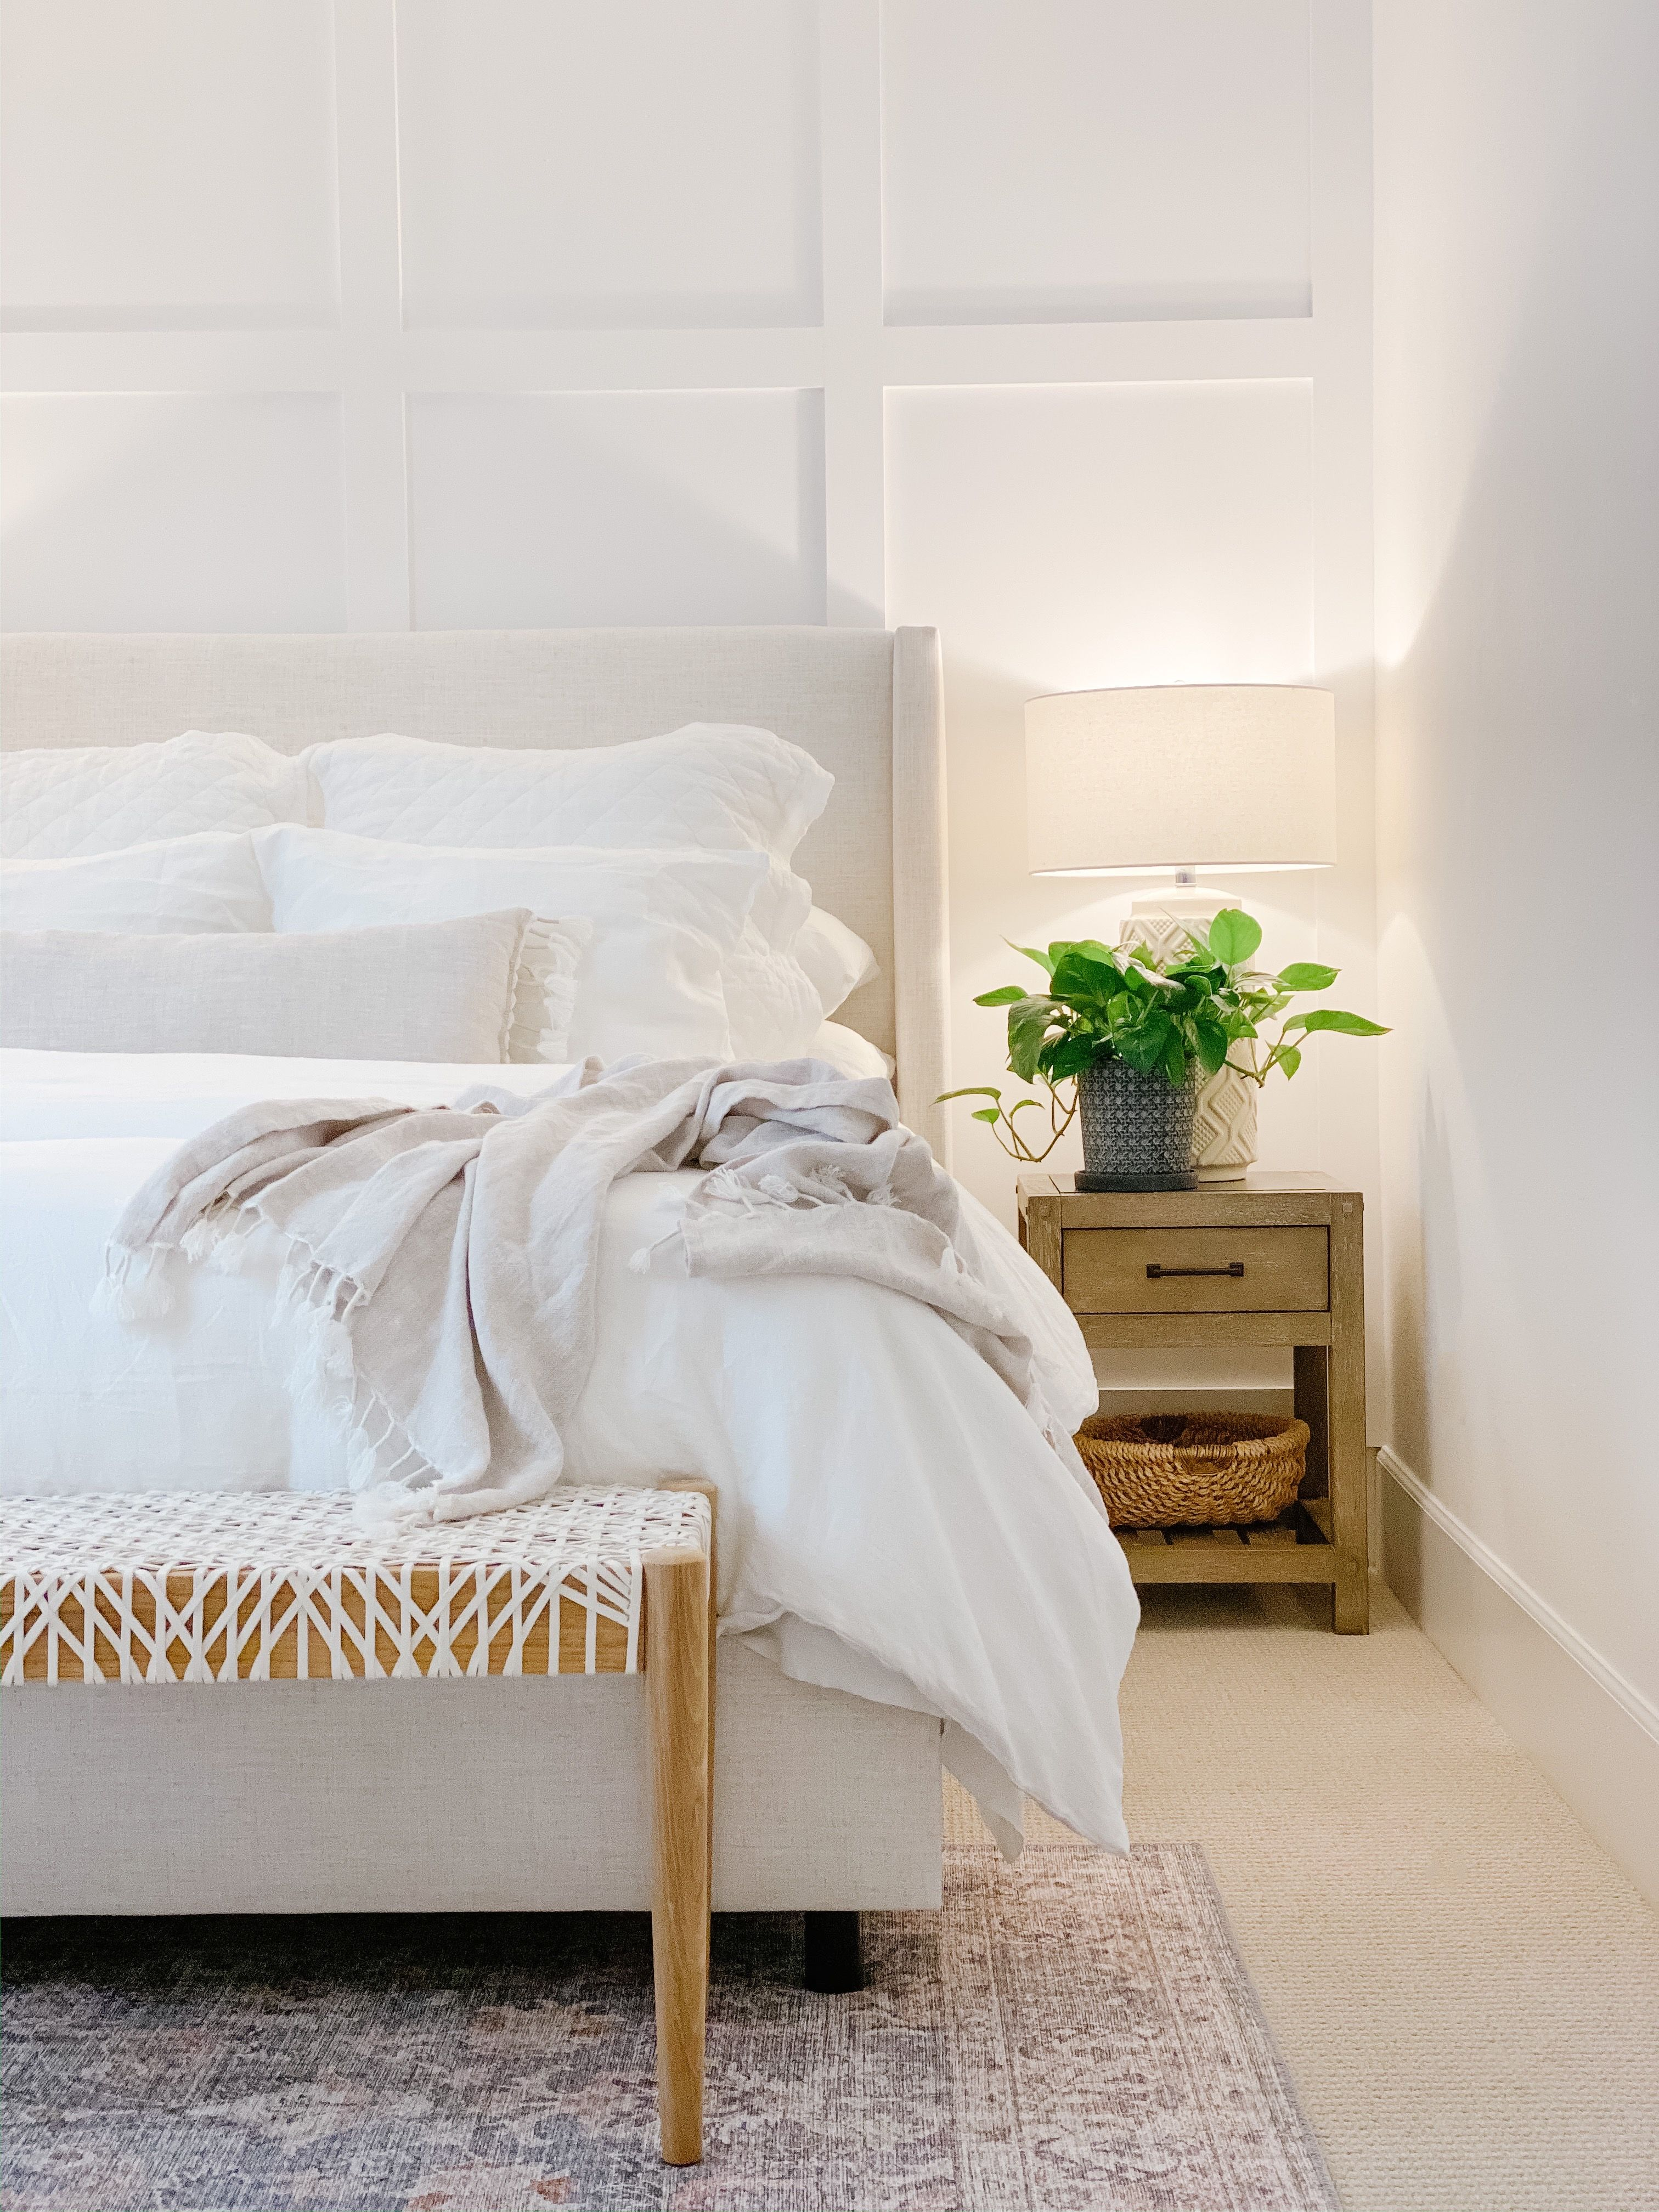 White Bedroom Decor Bedroom Interior Small Guest Bedroom Guest Bedroom Decor Neutral spare bedroom ideas